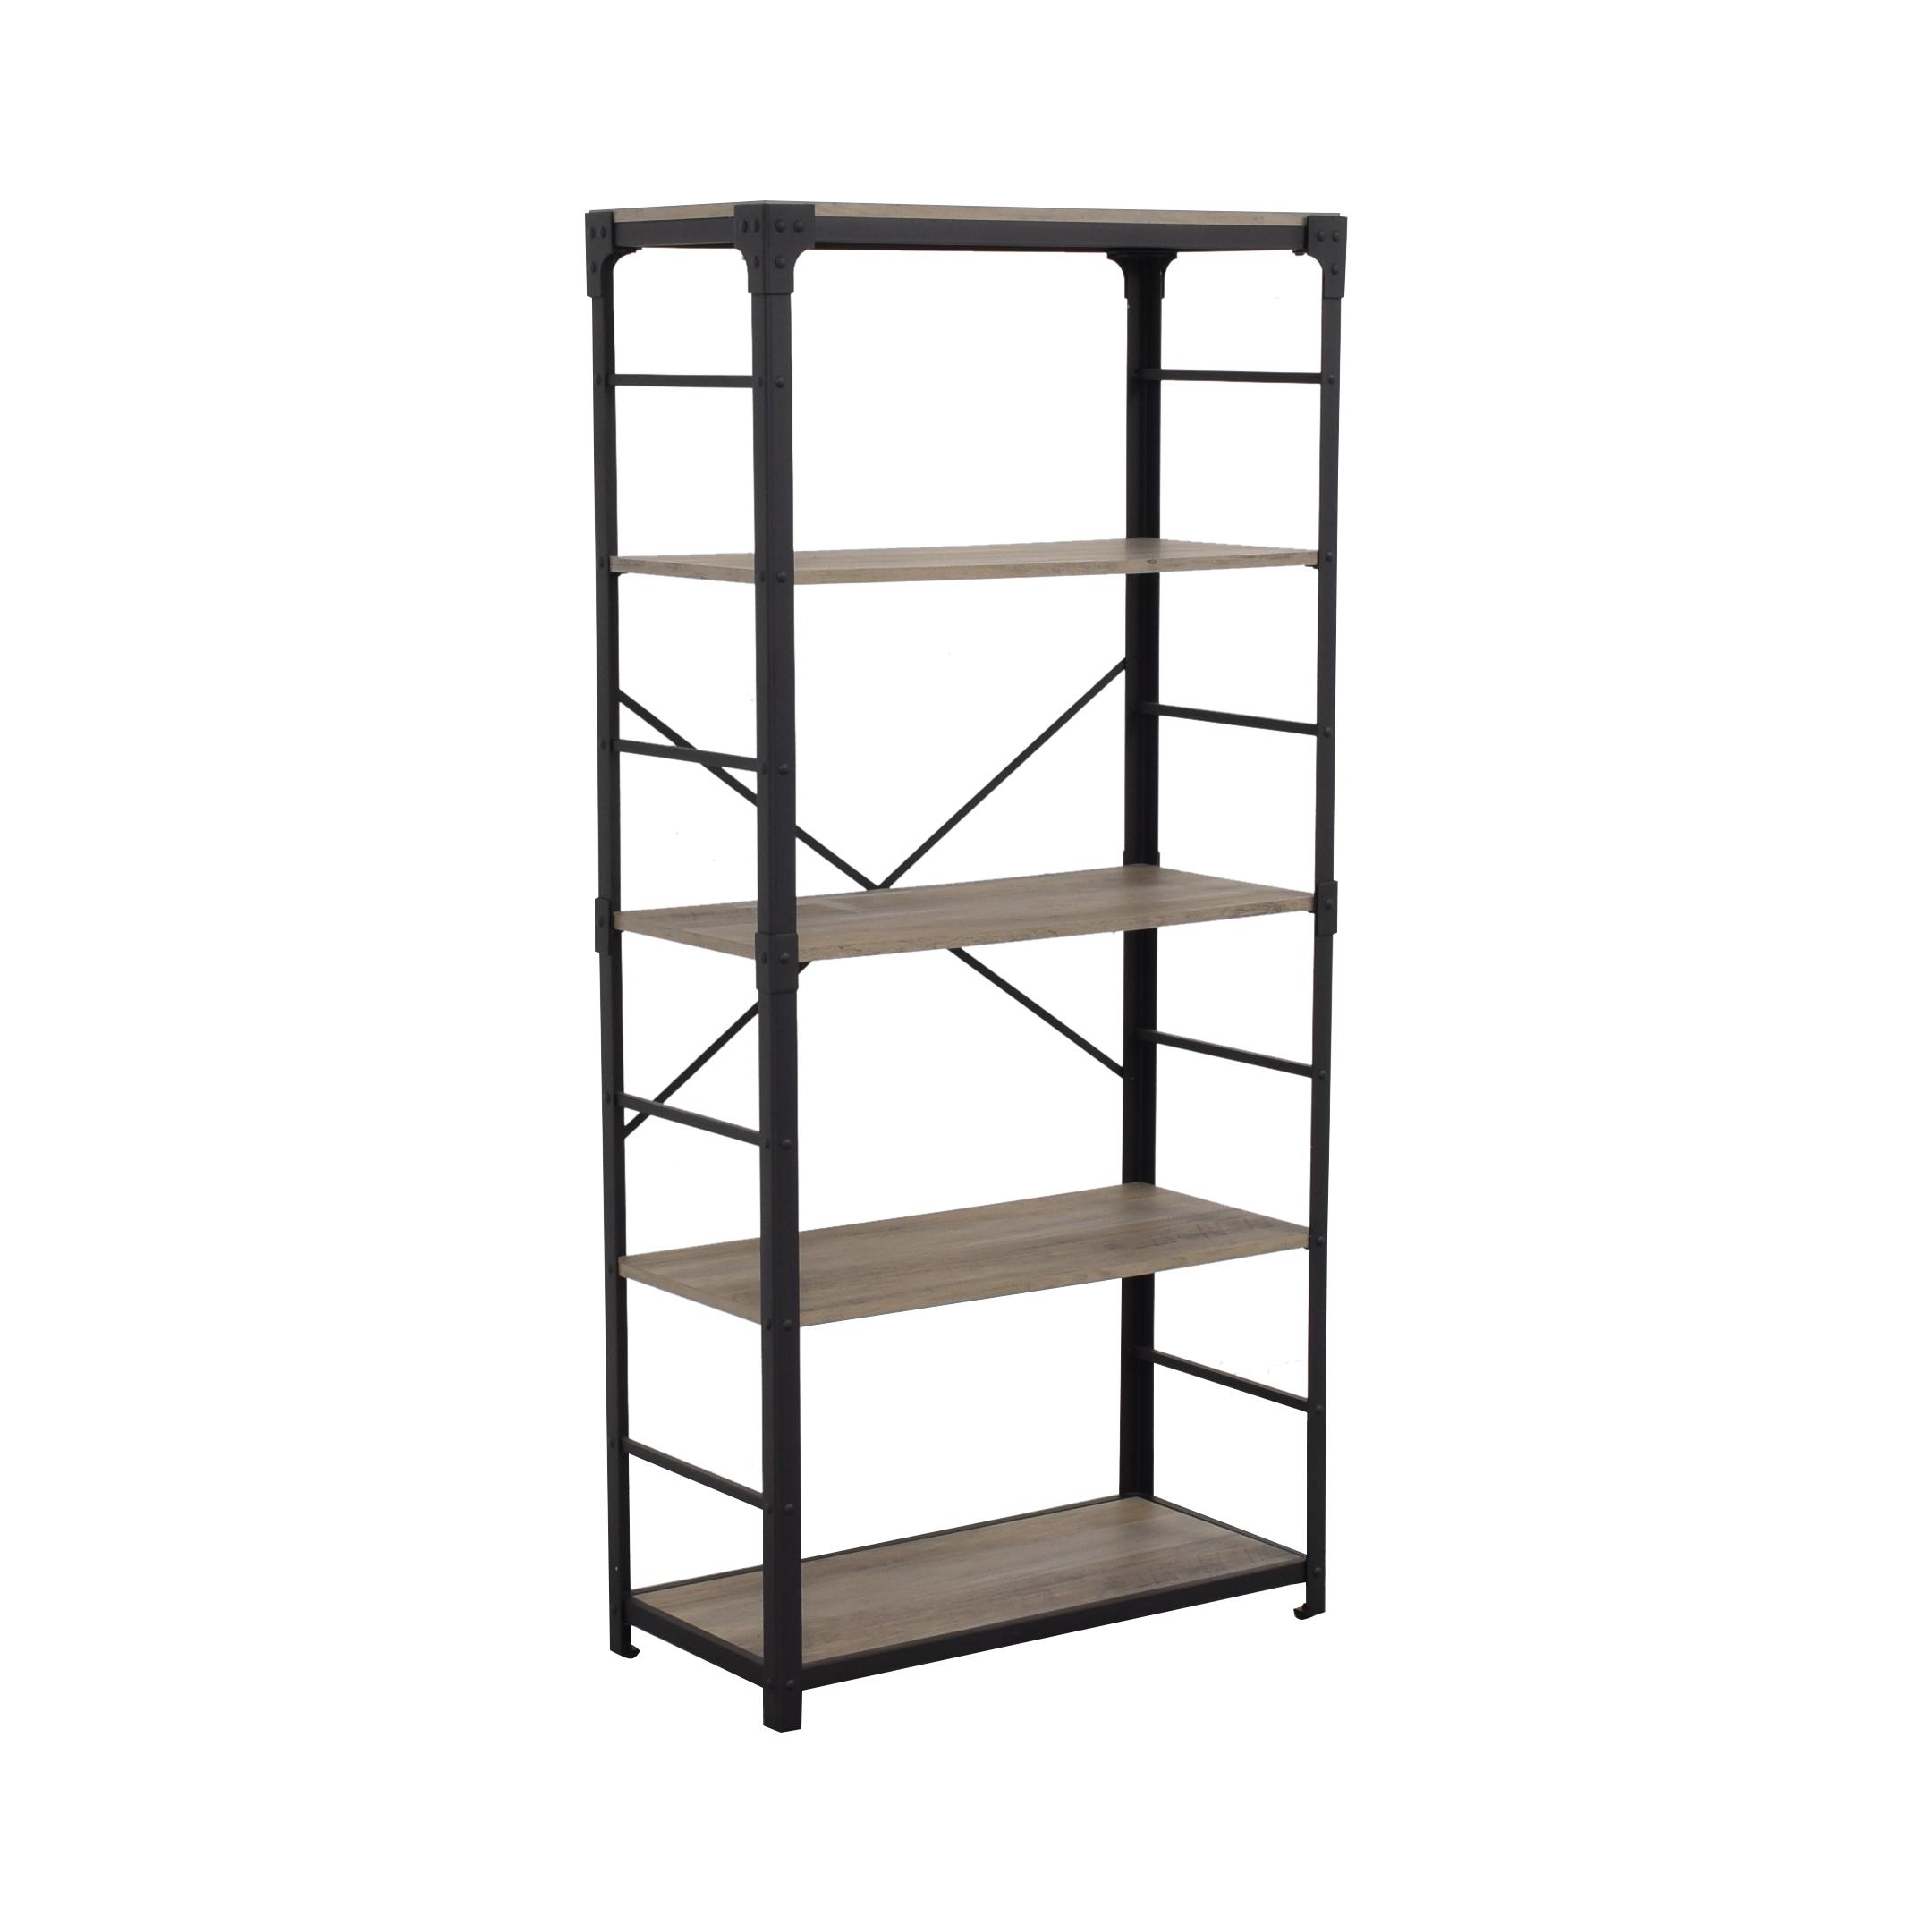 buy Room & Board Bookshelf Room & Board Storage